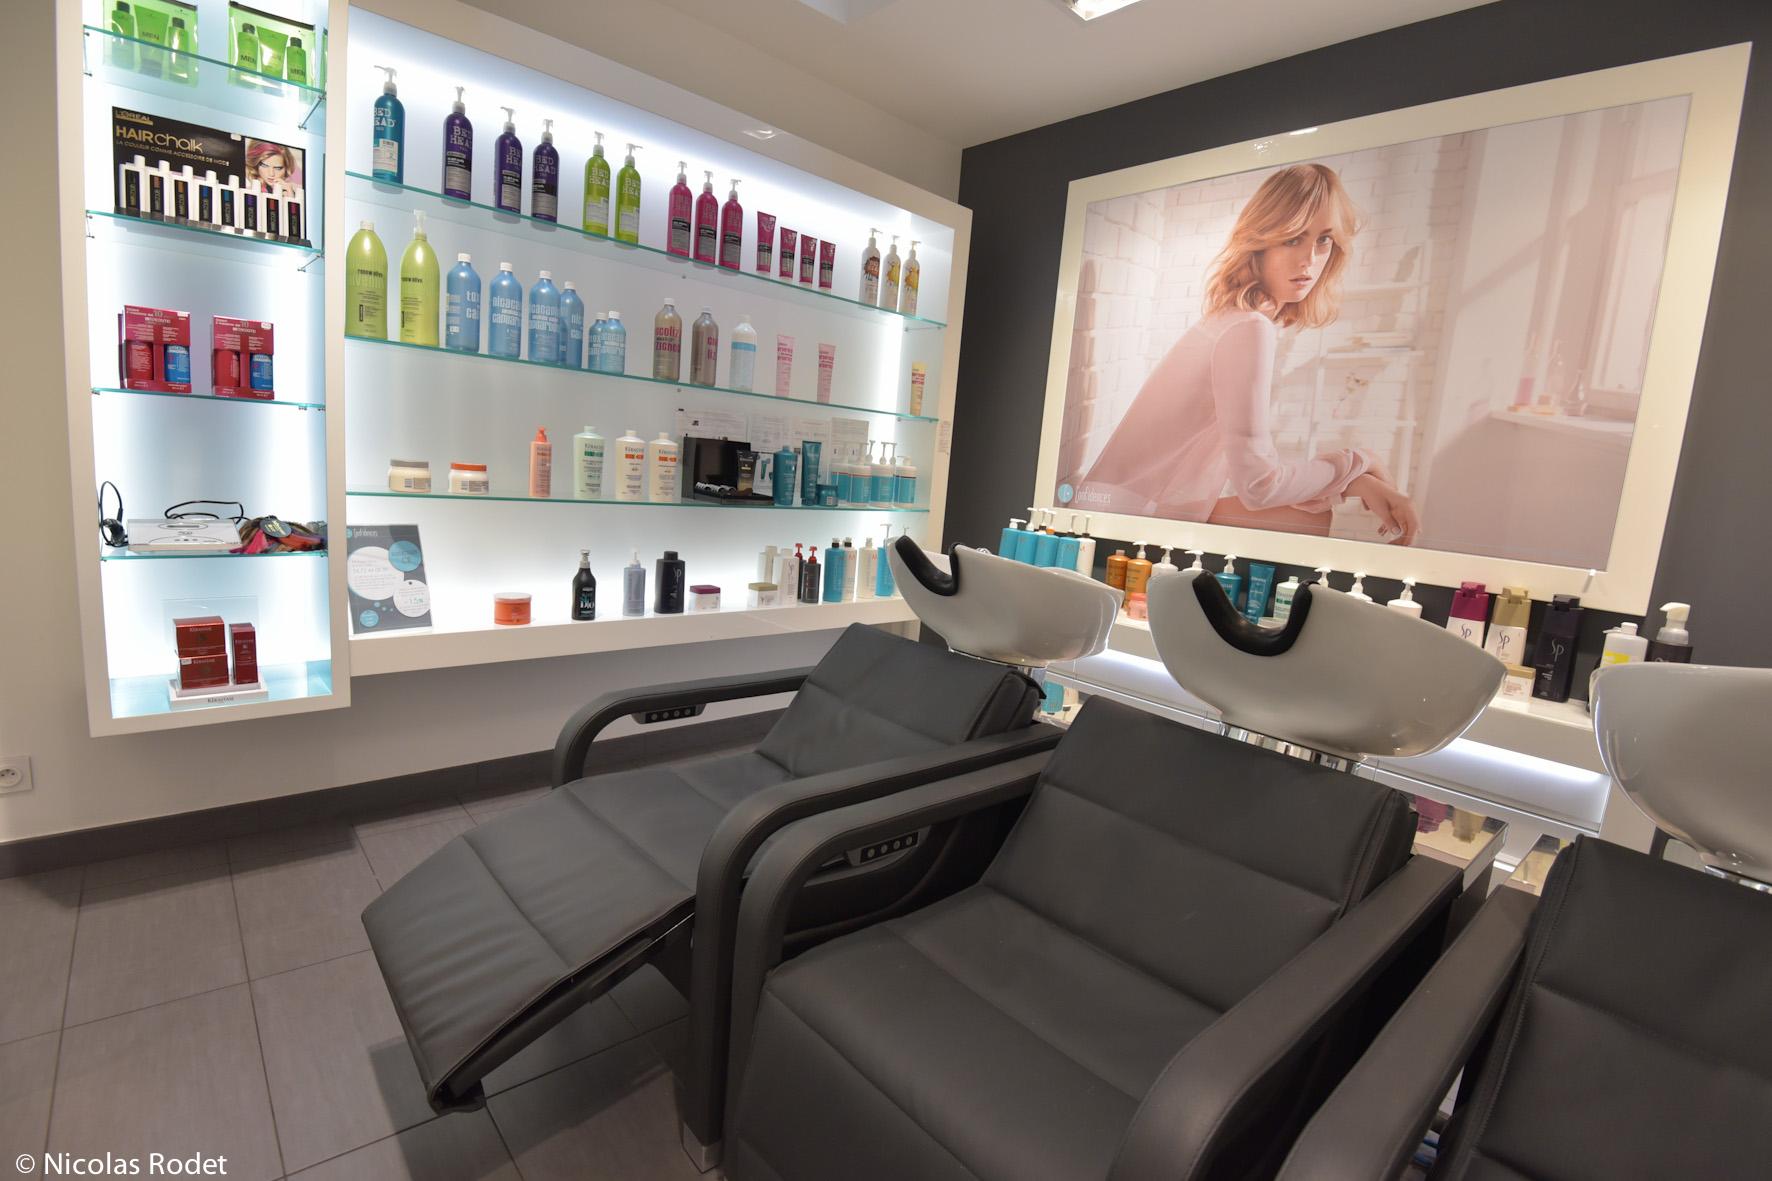 Confidences salon de coiffure lyon coiffures la mode - Salon de coiffure lyon ...